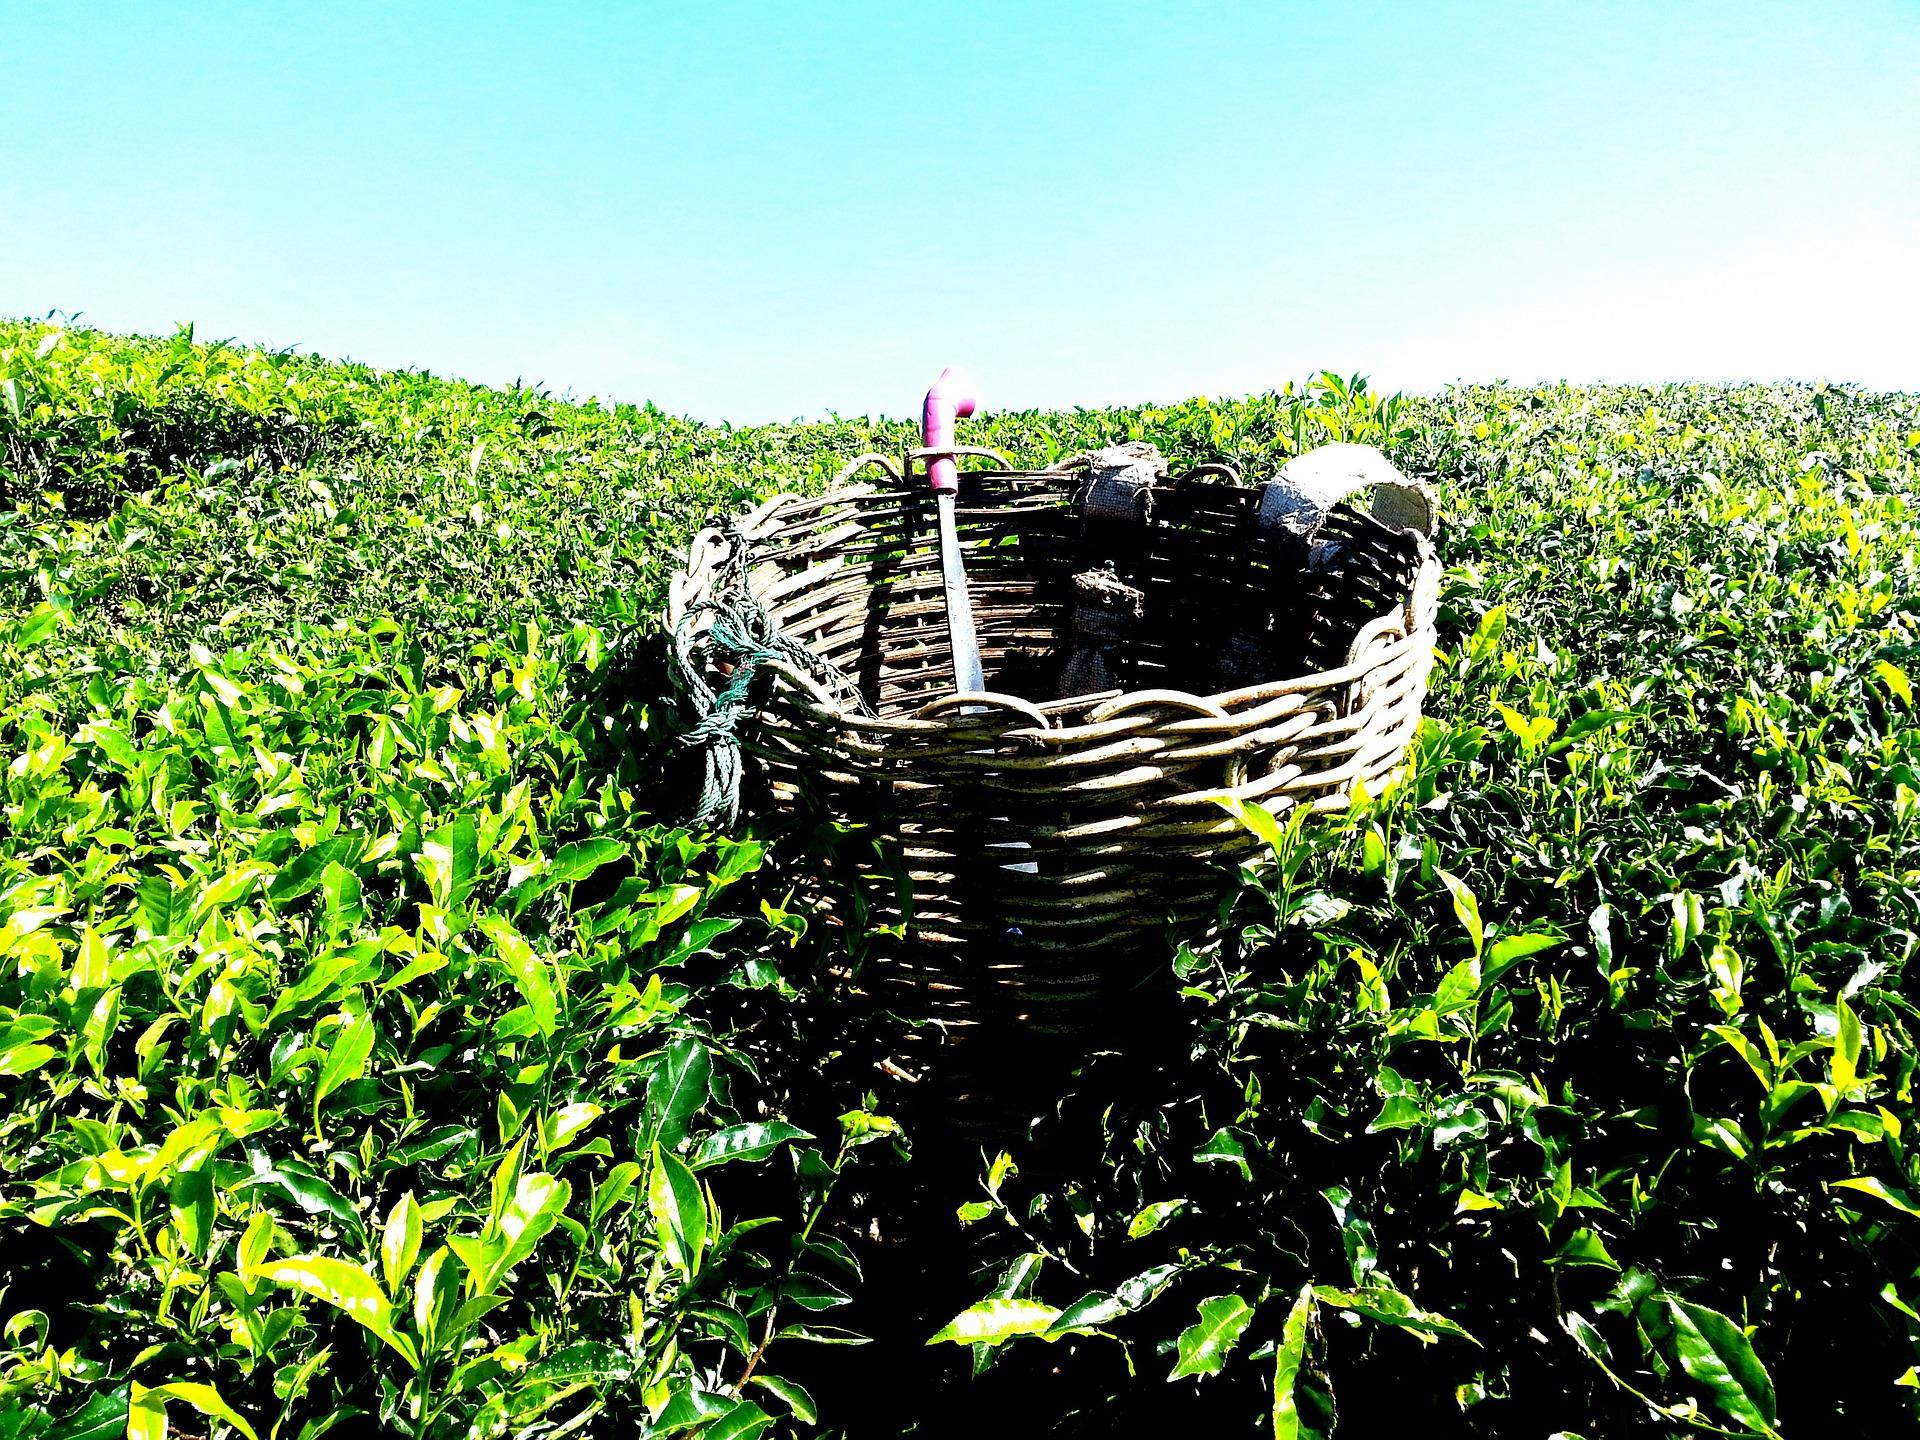 maleisie tea-plantation-261518_1920.jpg